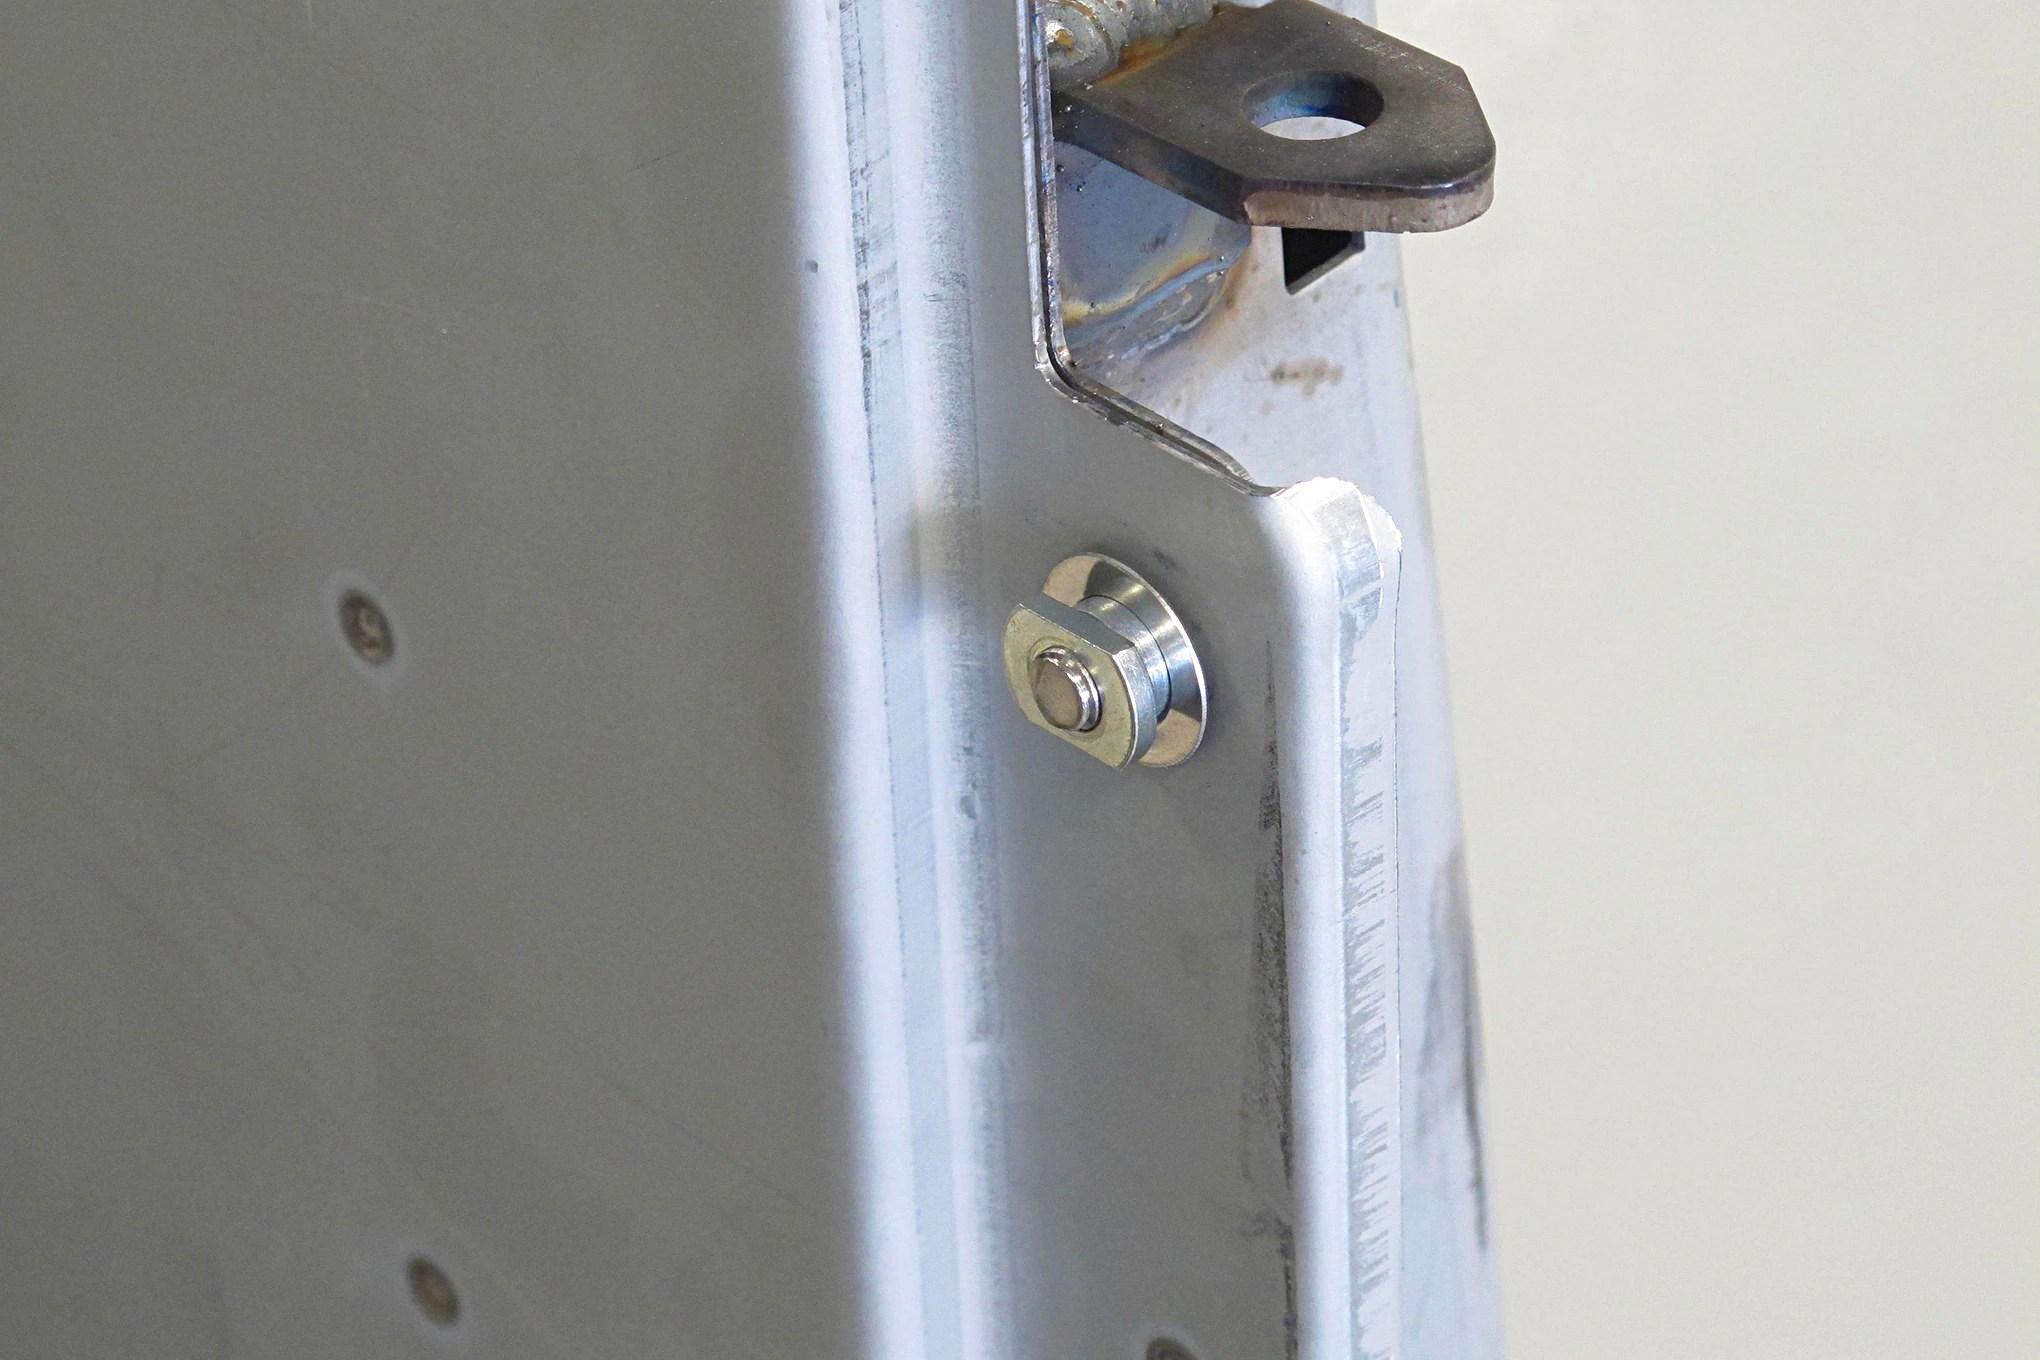 05-CLTP-170100-chevy-stepside-hidden-tailgate-latch-install.JPG